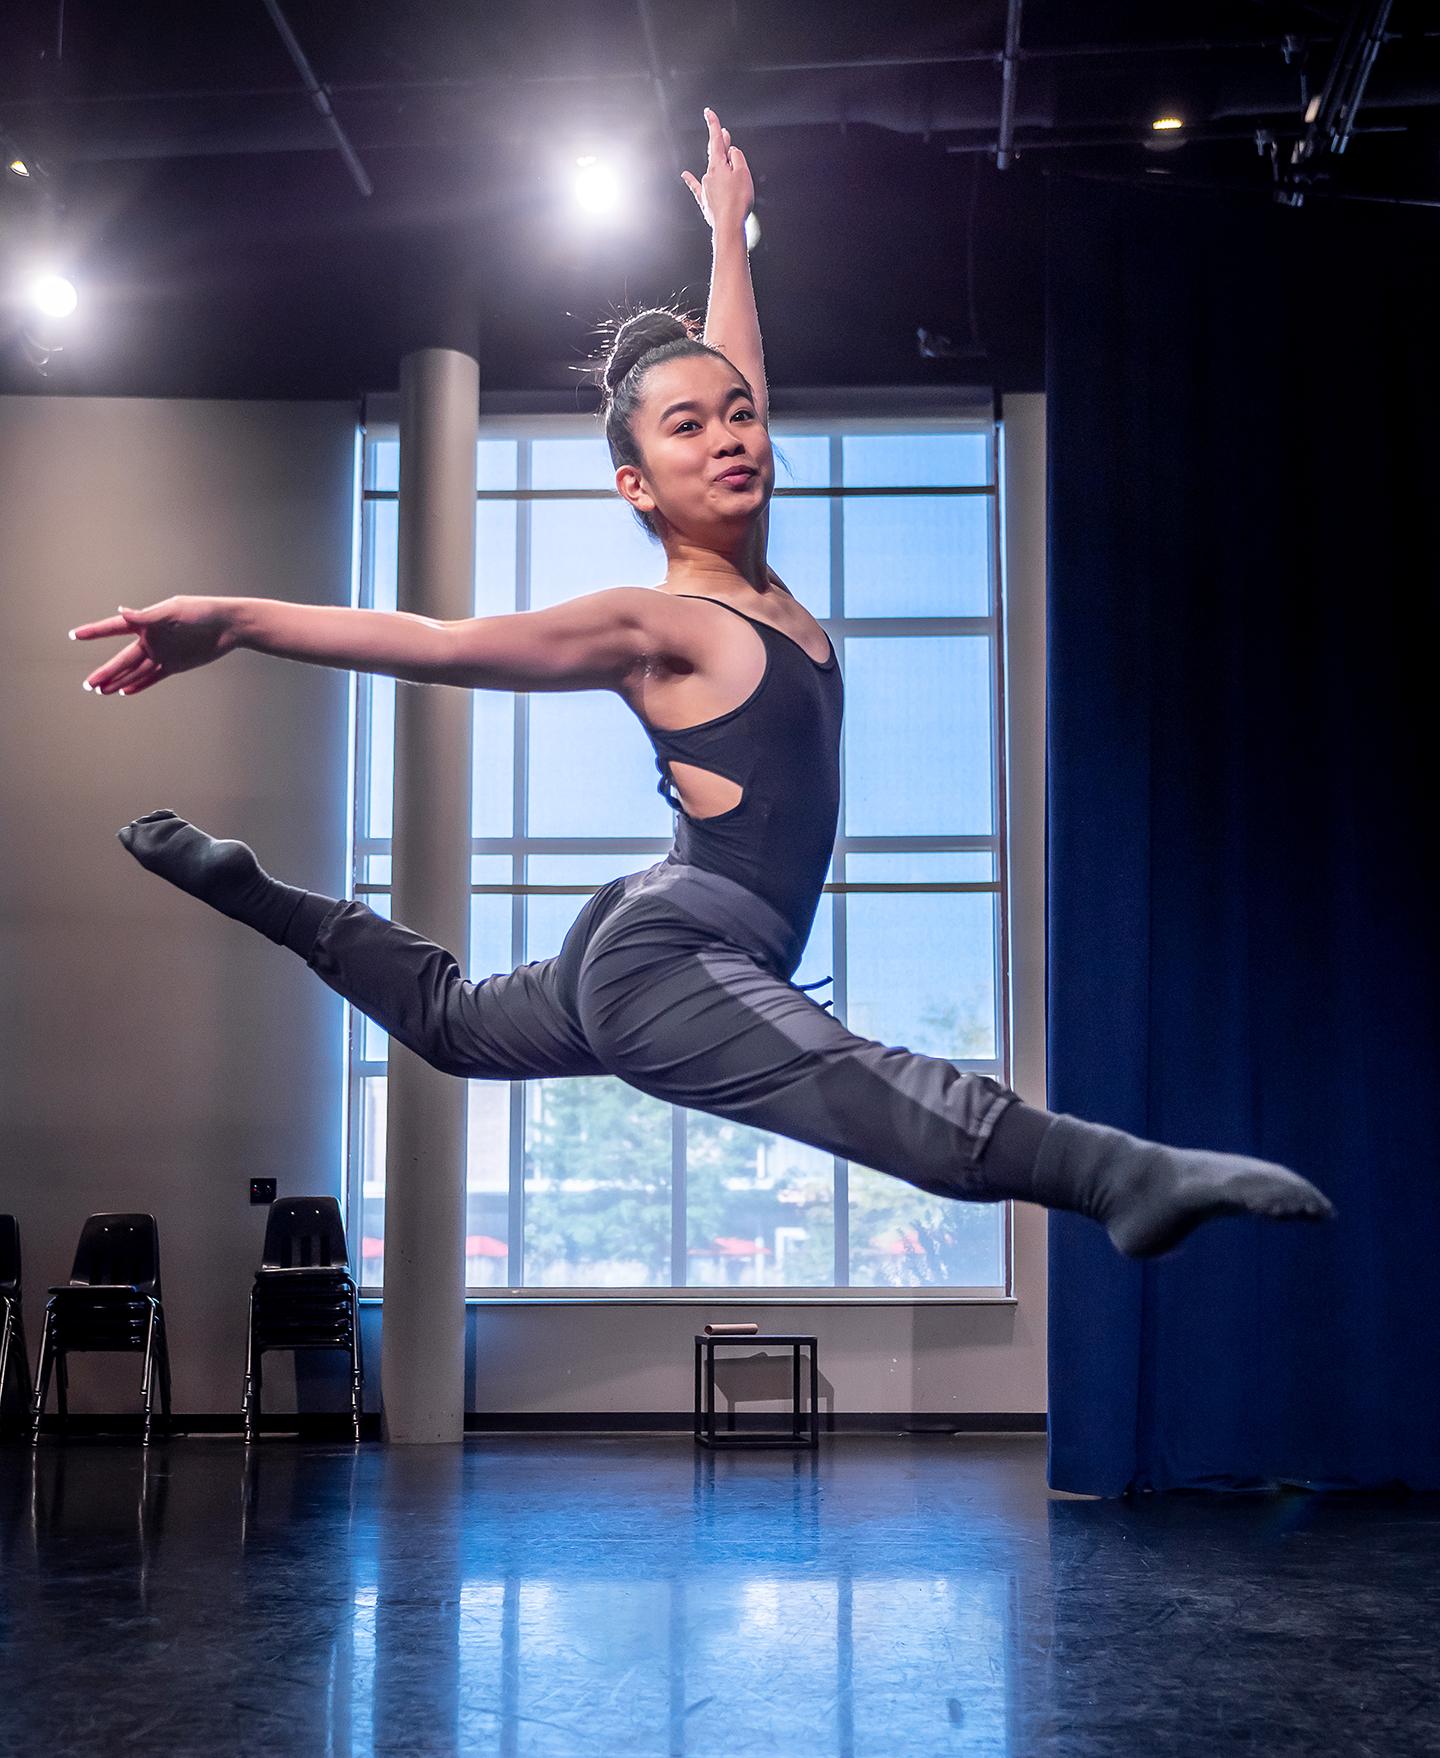 Nicole Arakaki leaping in the air